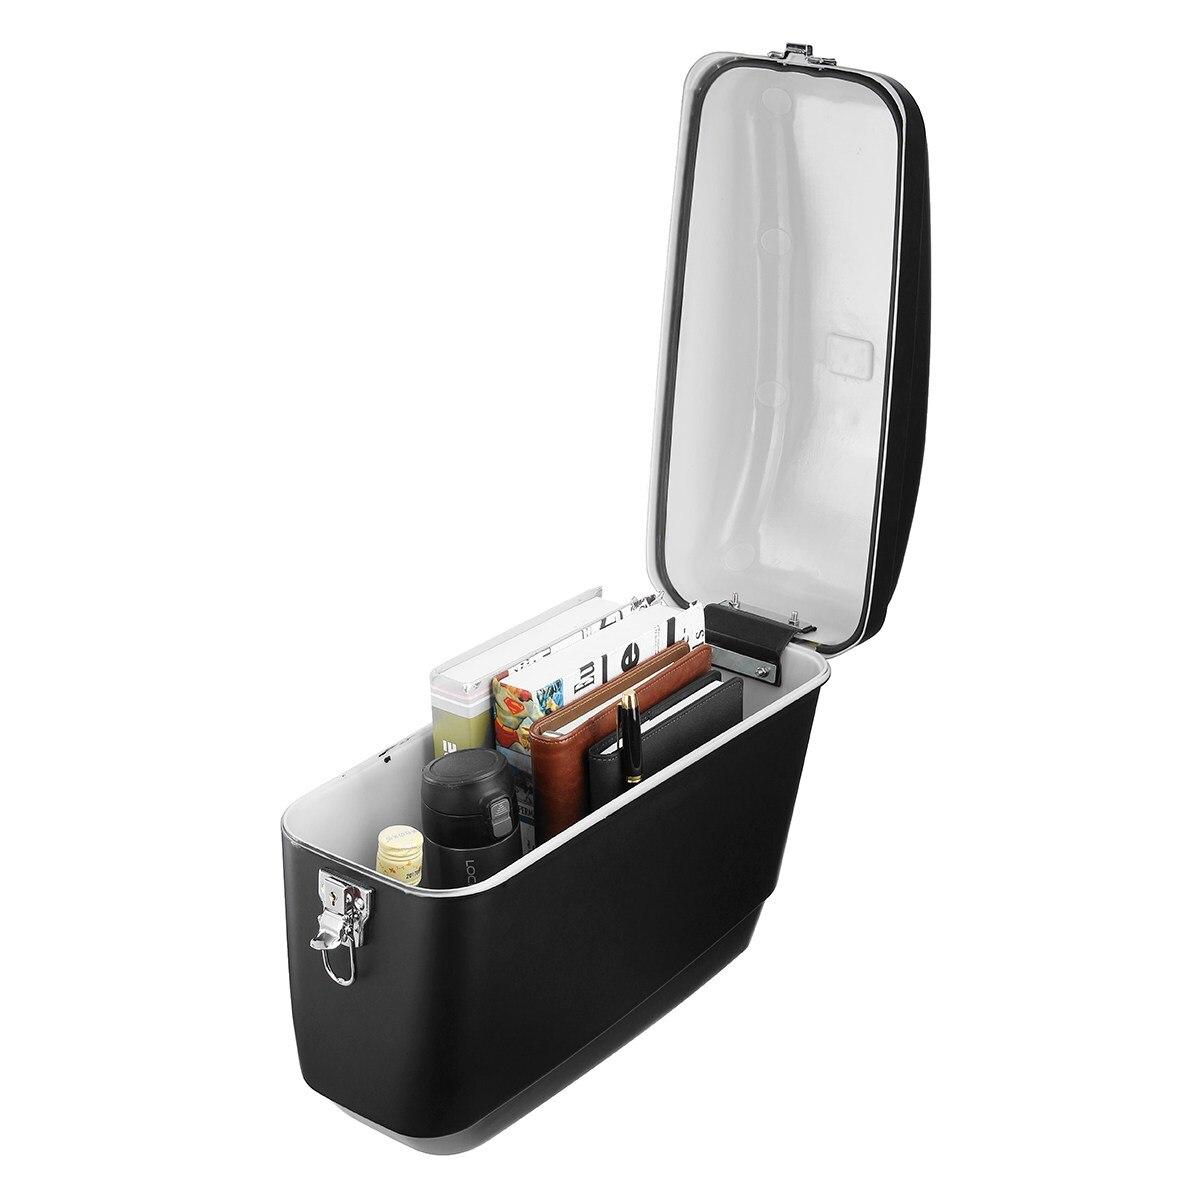 1 Pair 30L Large Motorcycle Side Boxs Luggage Tank Tail Bag Hard Case Saddle Bags For Harley Cruisers For Kawasaki/Honda